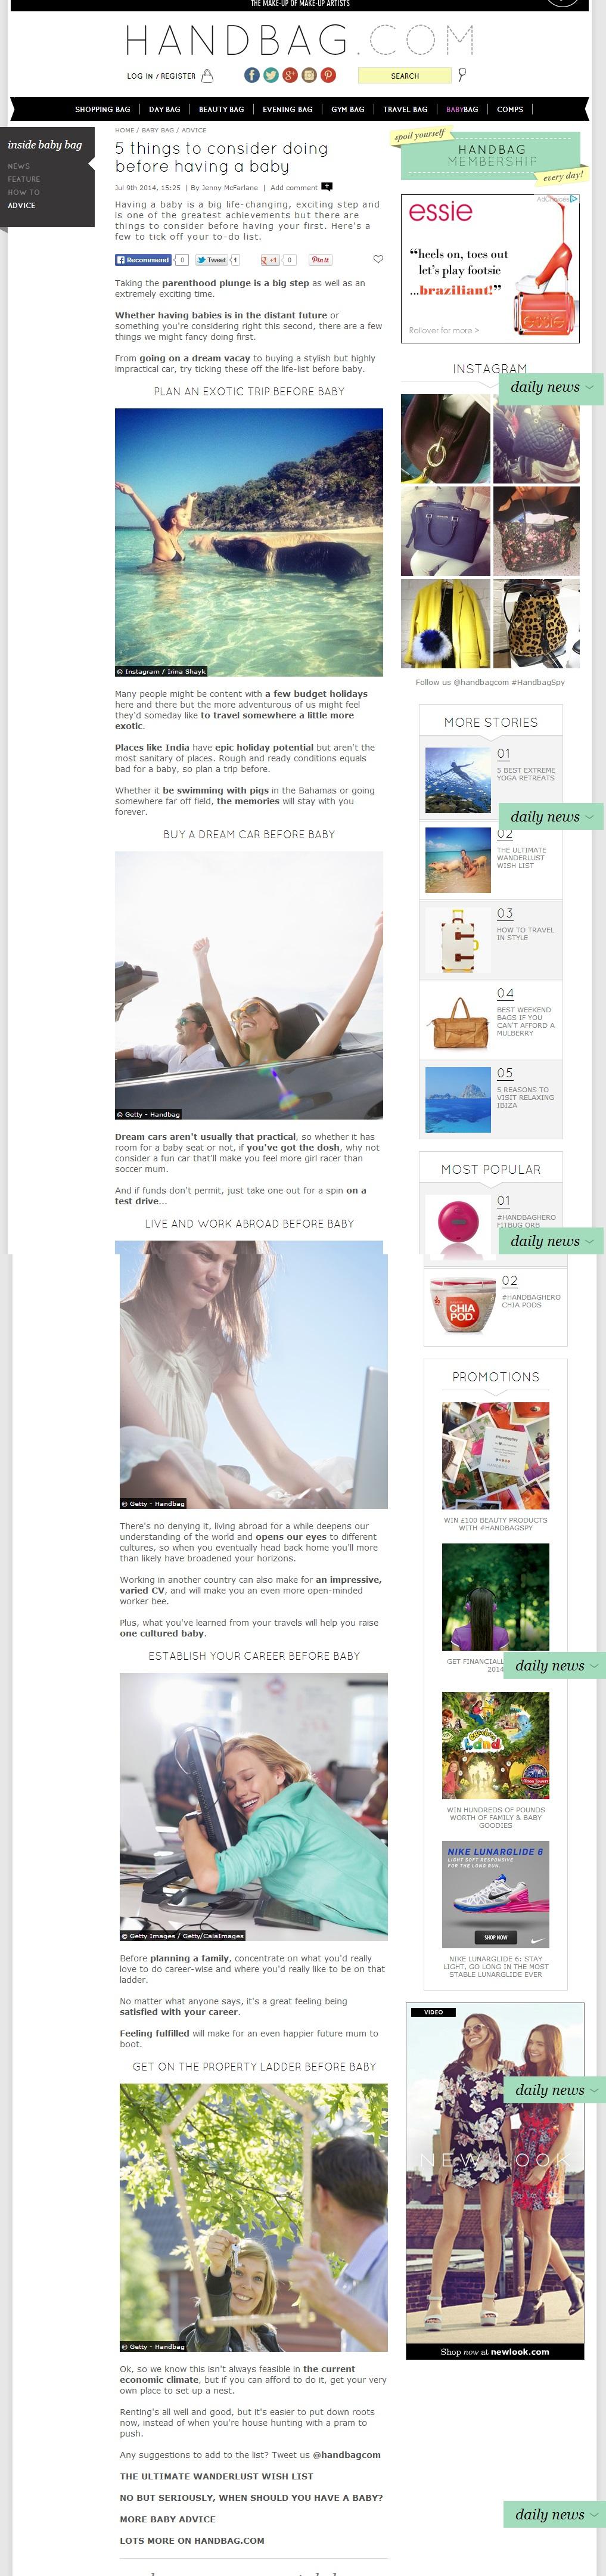 screencapture-www-handbag-com-baby-bag-advice-a583142-5-things-to-consider-doing-before-having-a-baby-html